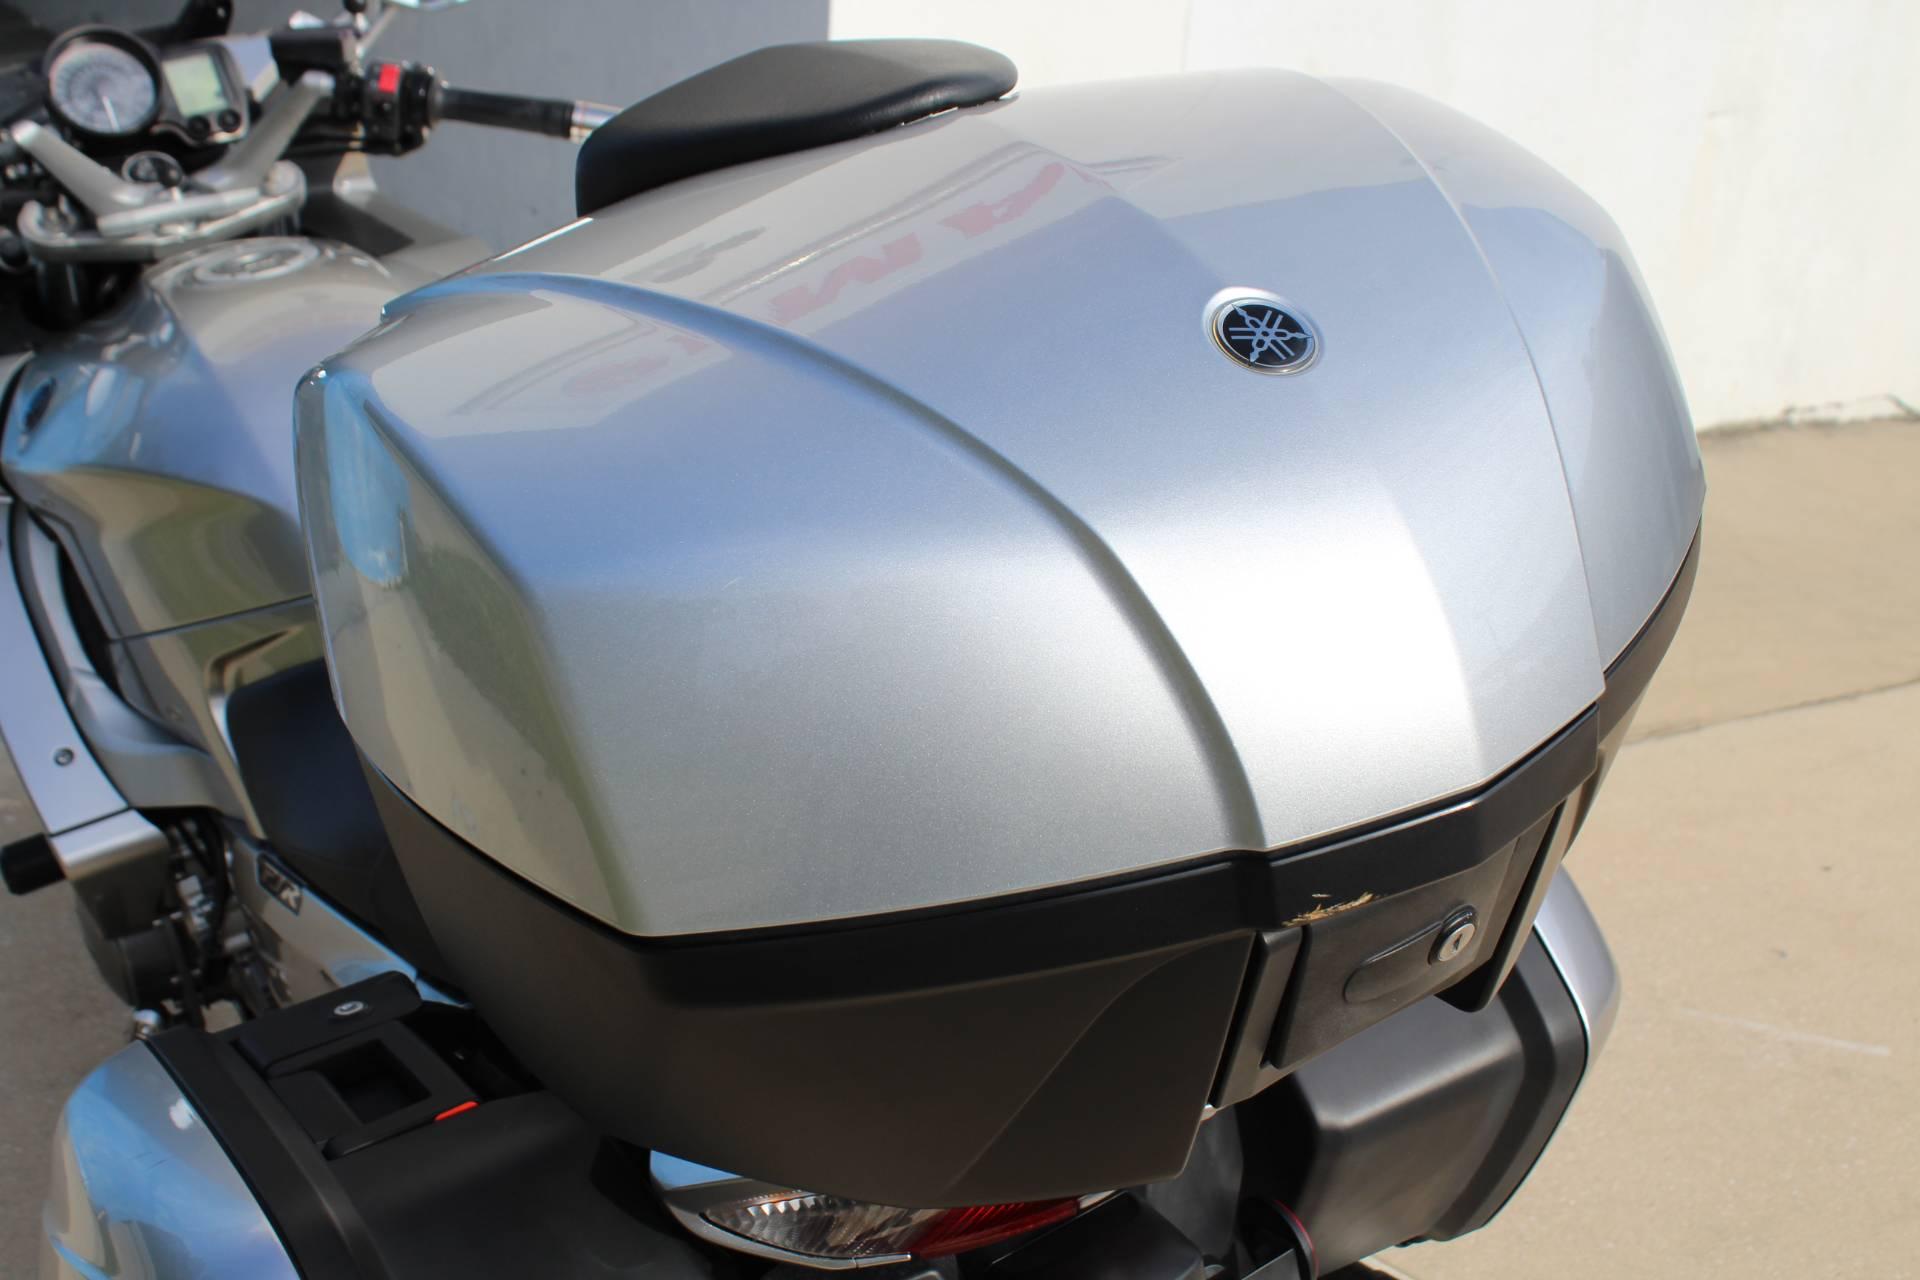 2010 Yamaha FJR1300A 8